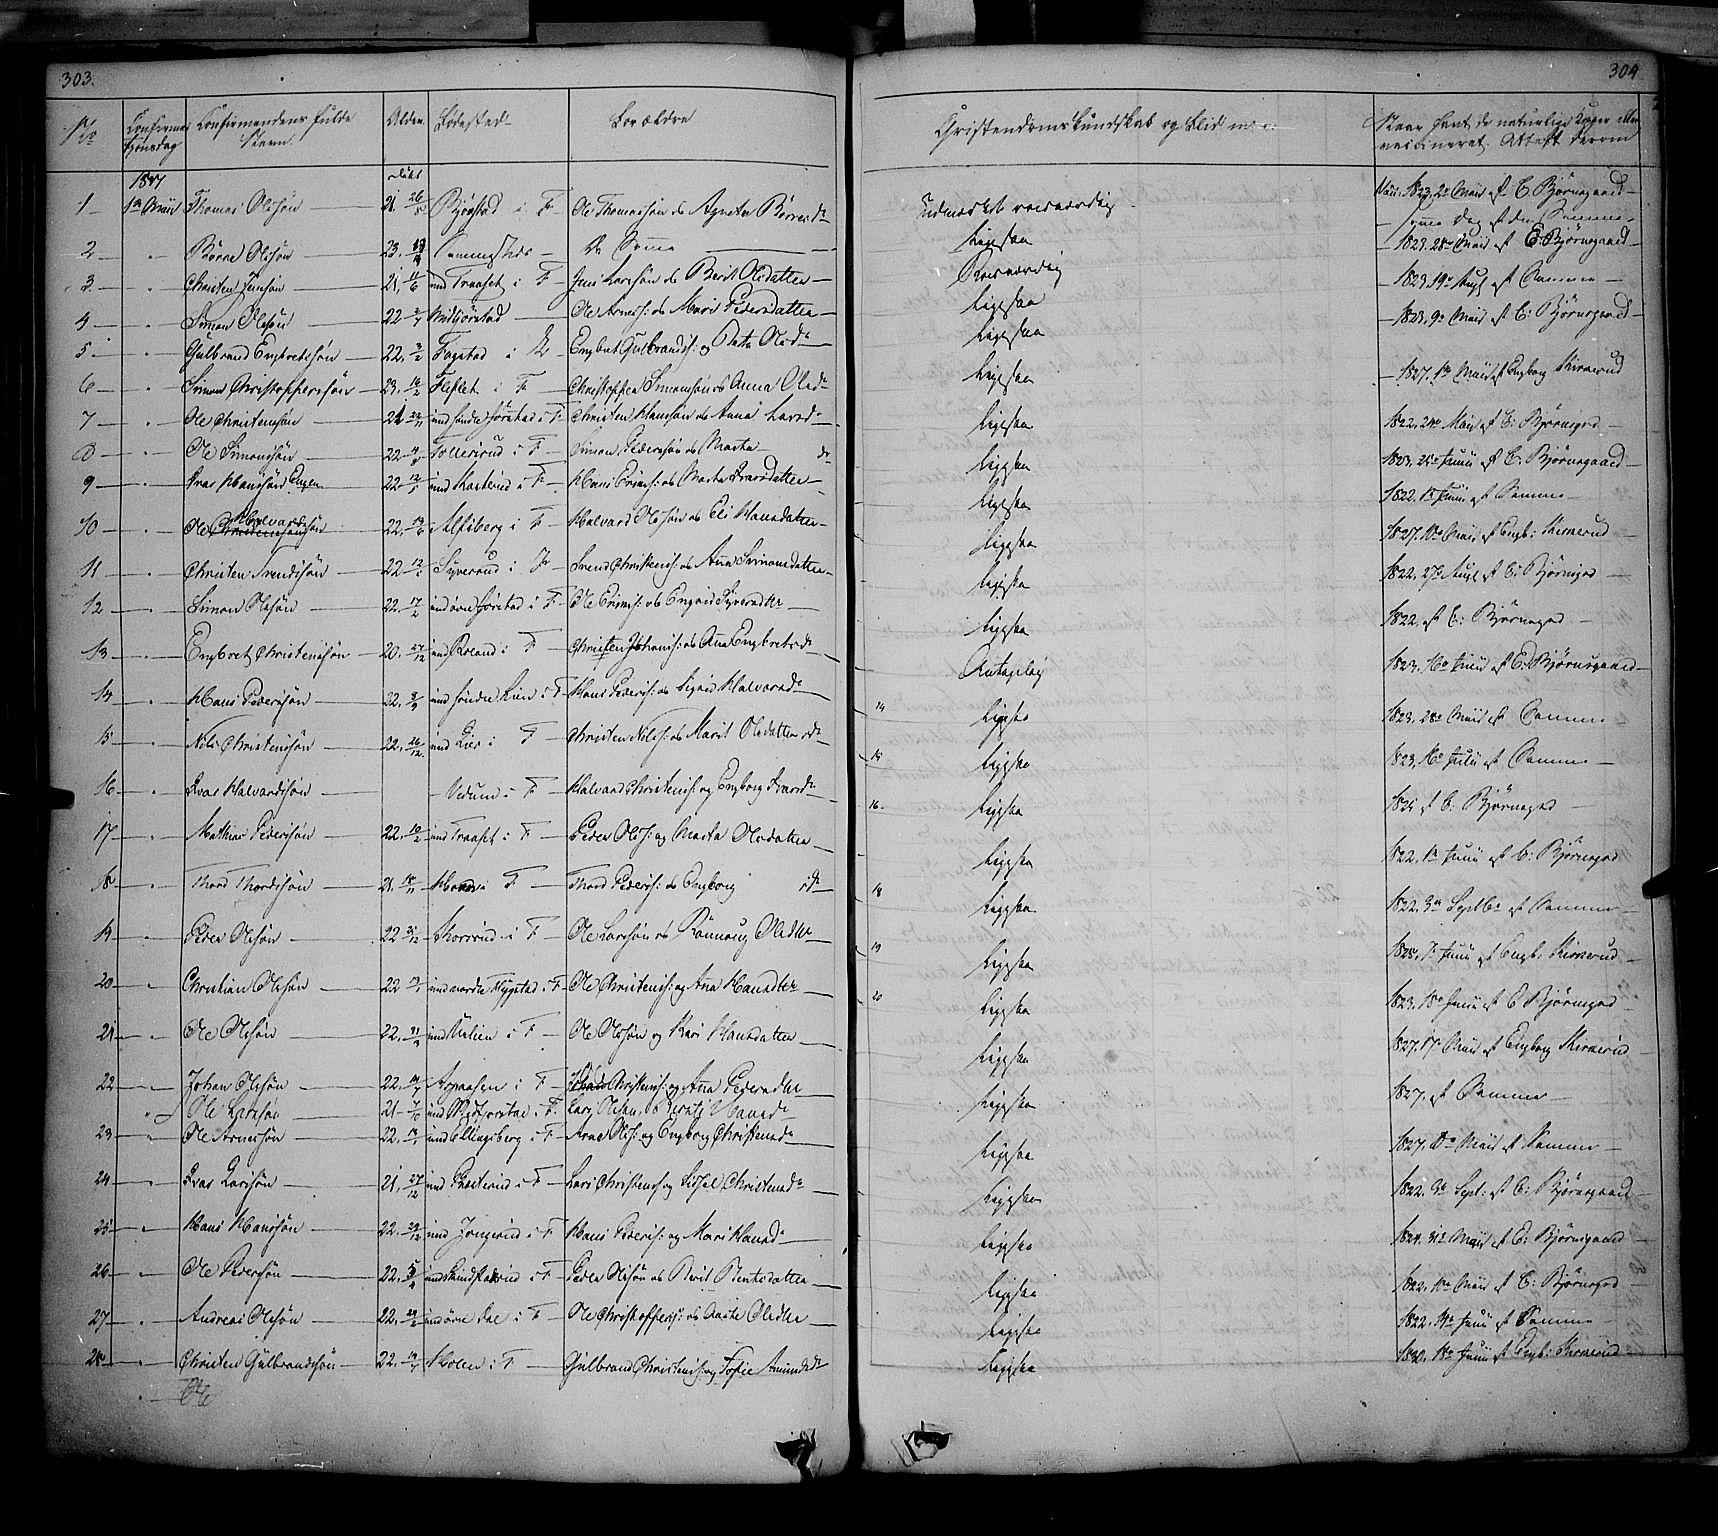 SAH, Fåberg prestekontor, Ministerialbok nr. 5, 1836-1854, s. 303-304